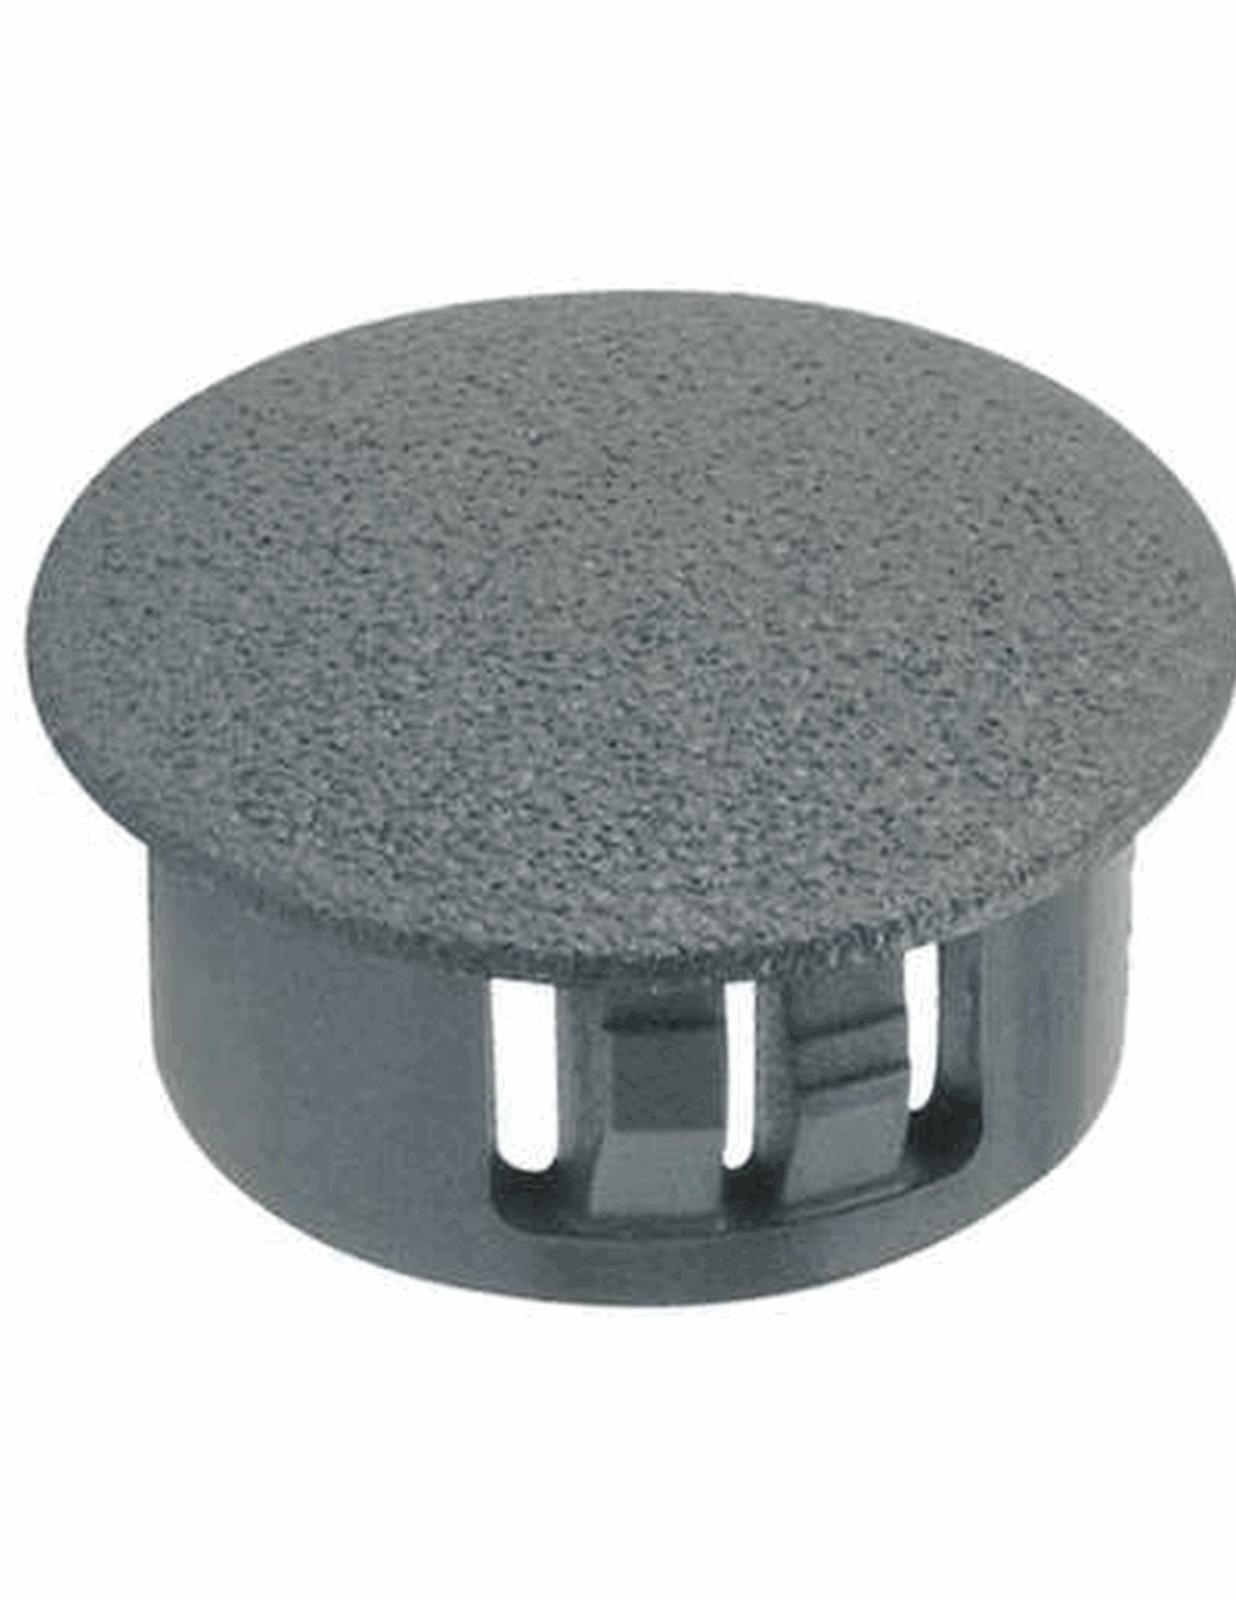 "1 1//4/"" Nylon Panel Plugs Dome Plugs Locking Plug Black"